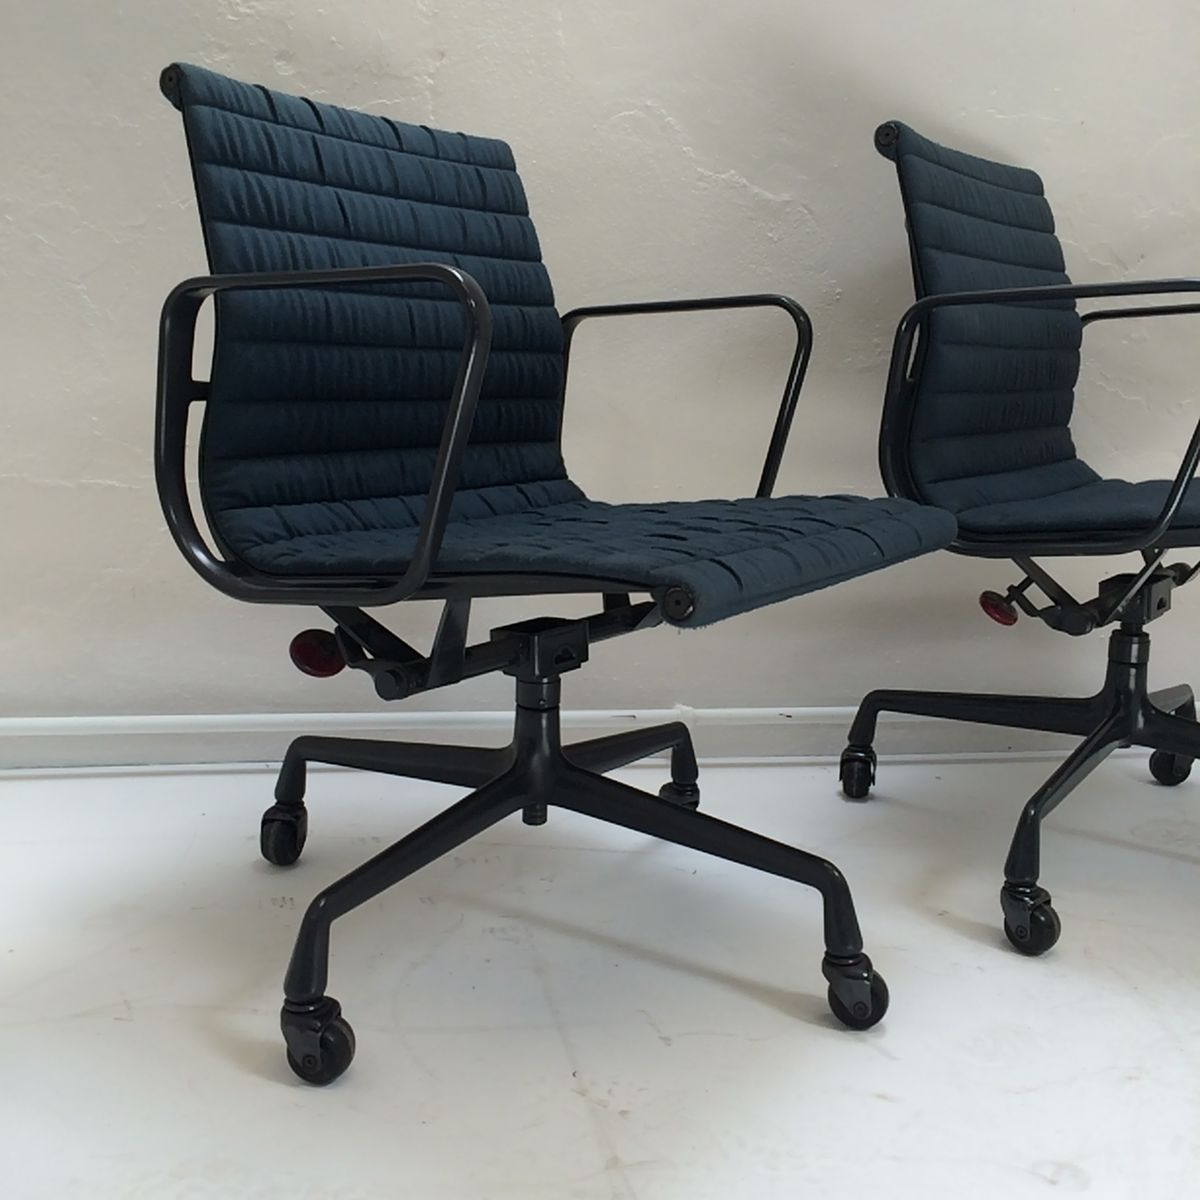 ea108 aluminium b rostuhl von charles eames f r herman miller 1950er bei pamono kaufen. Black Bedroom Furniture Sets. Home Design Ideas